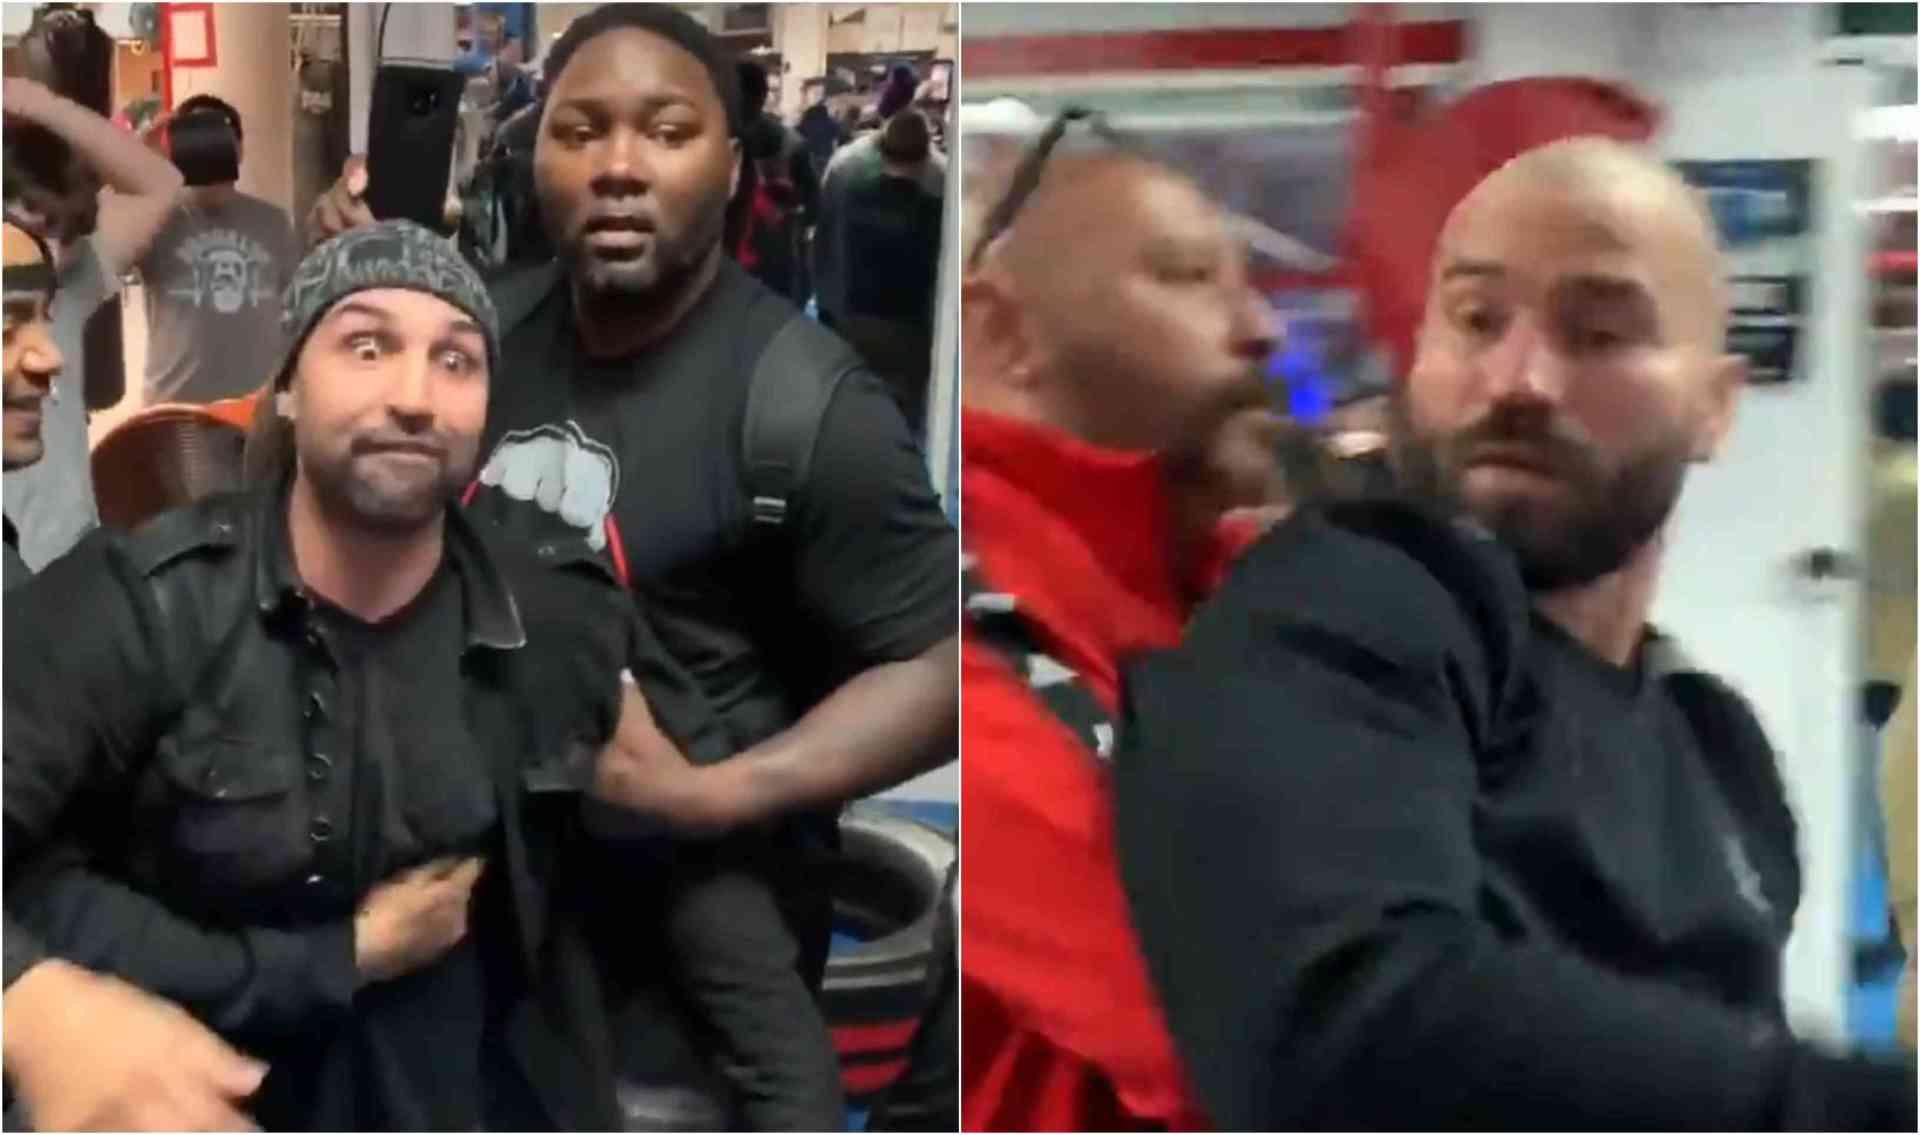 VIDEO: Paulie Malignaggi slaps Artem Lobov after exchanging heated words! - Lobov